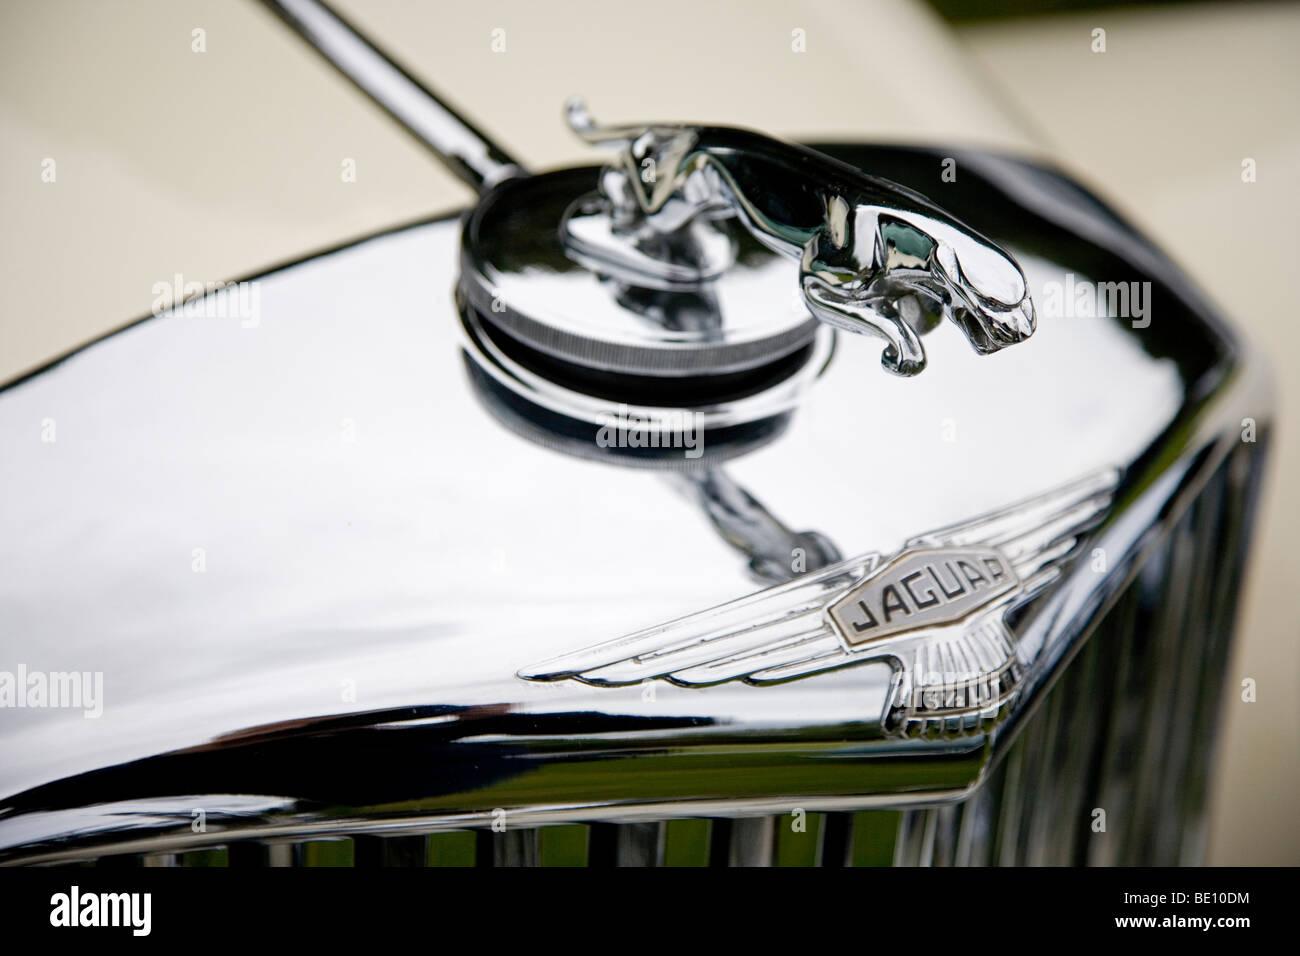 Silber springt Jaguar Ornament Emblem auf einem Jaguar Oldtimer bei der jährlichen Wilton Park Classic Car Stockbild